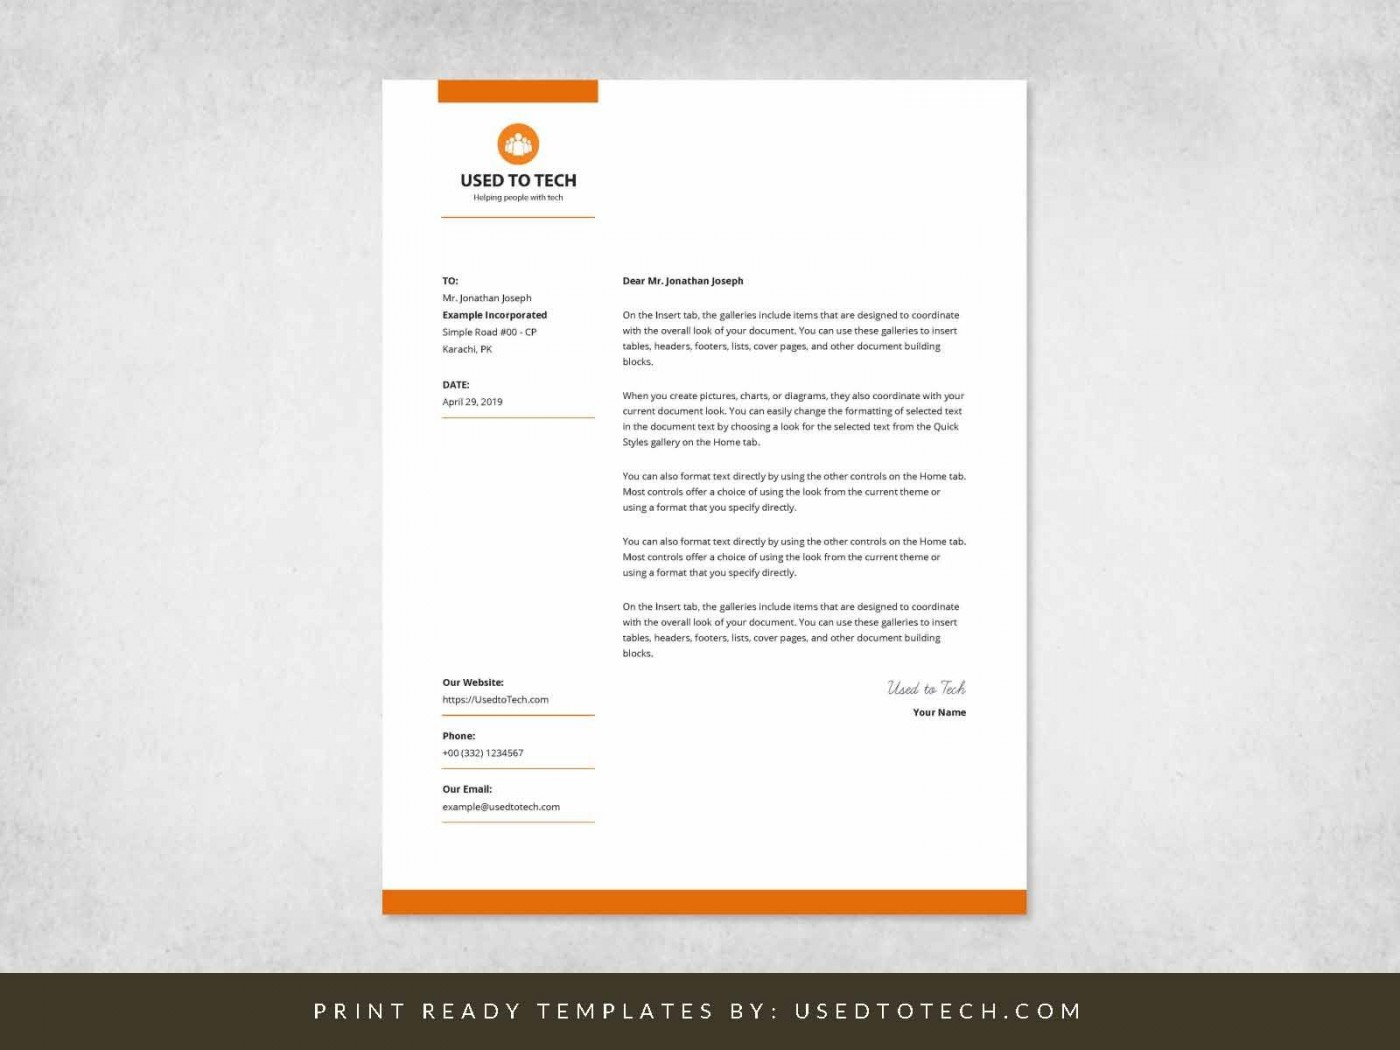 000 Impressive Letterhead Sample Free Download Image  Template Ai Microsoft Word Restaurant1400